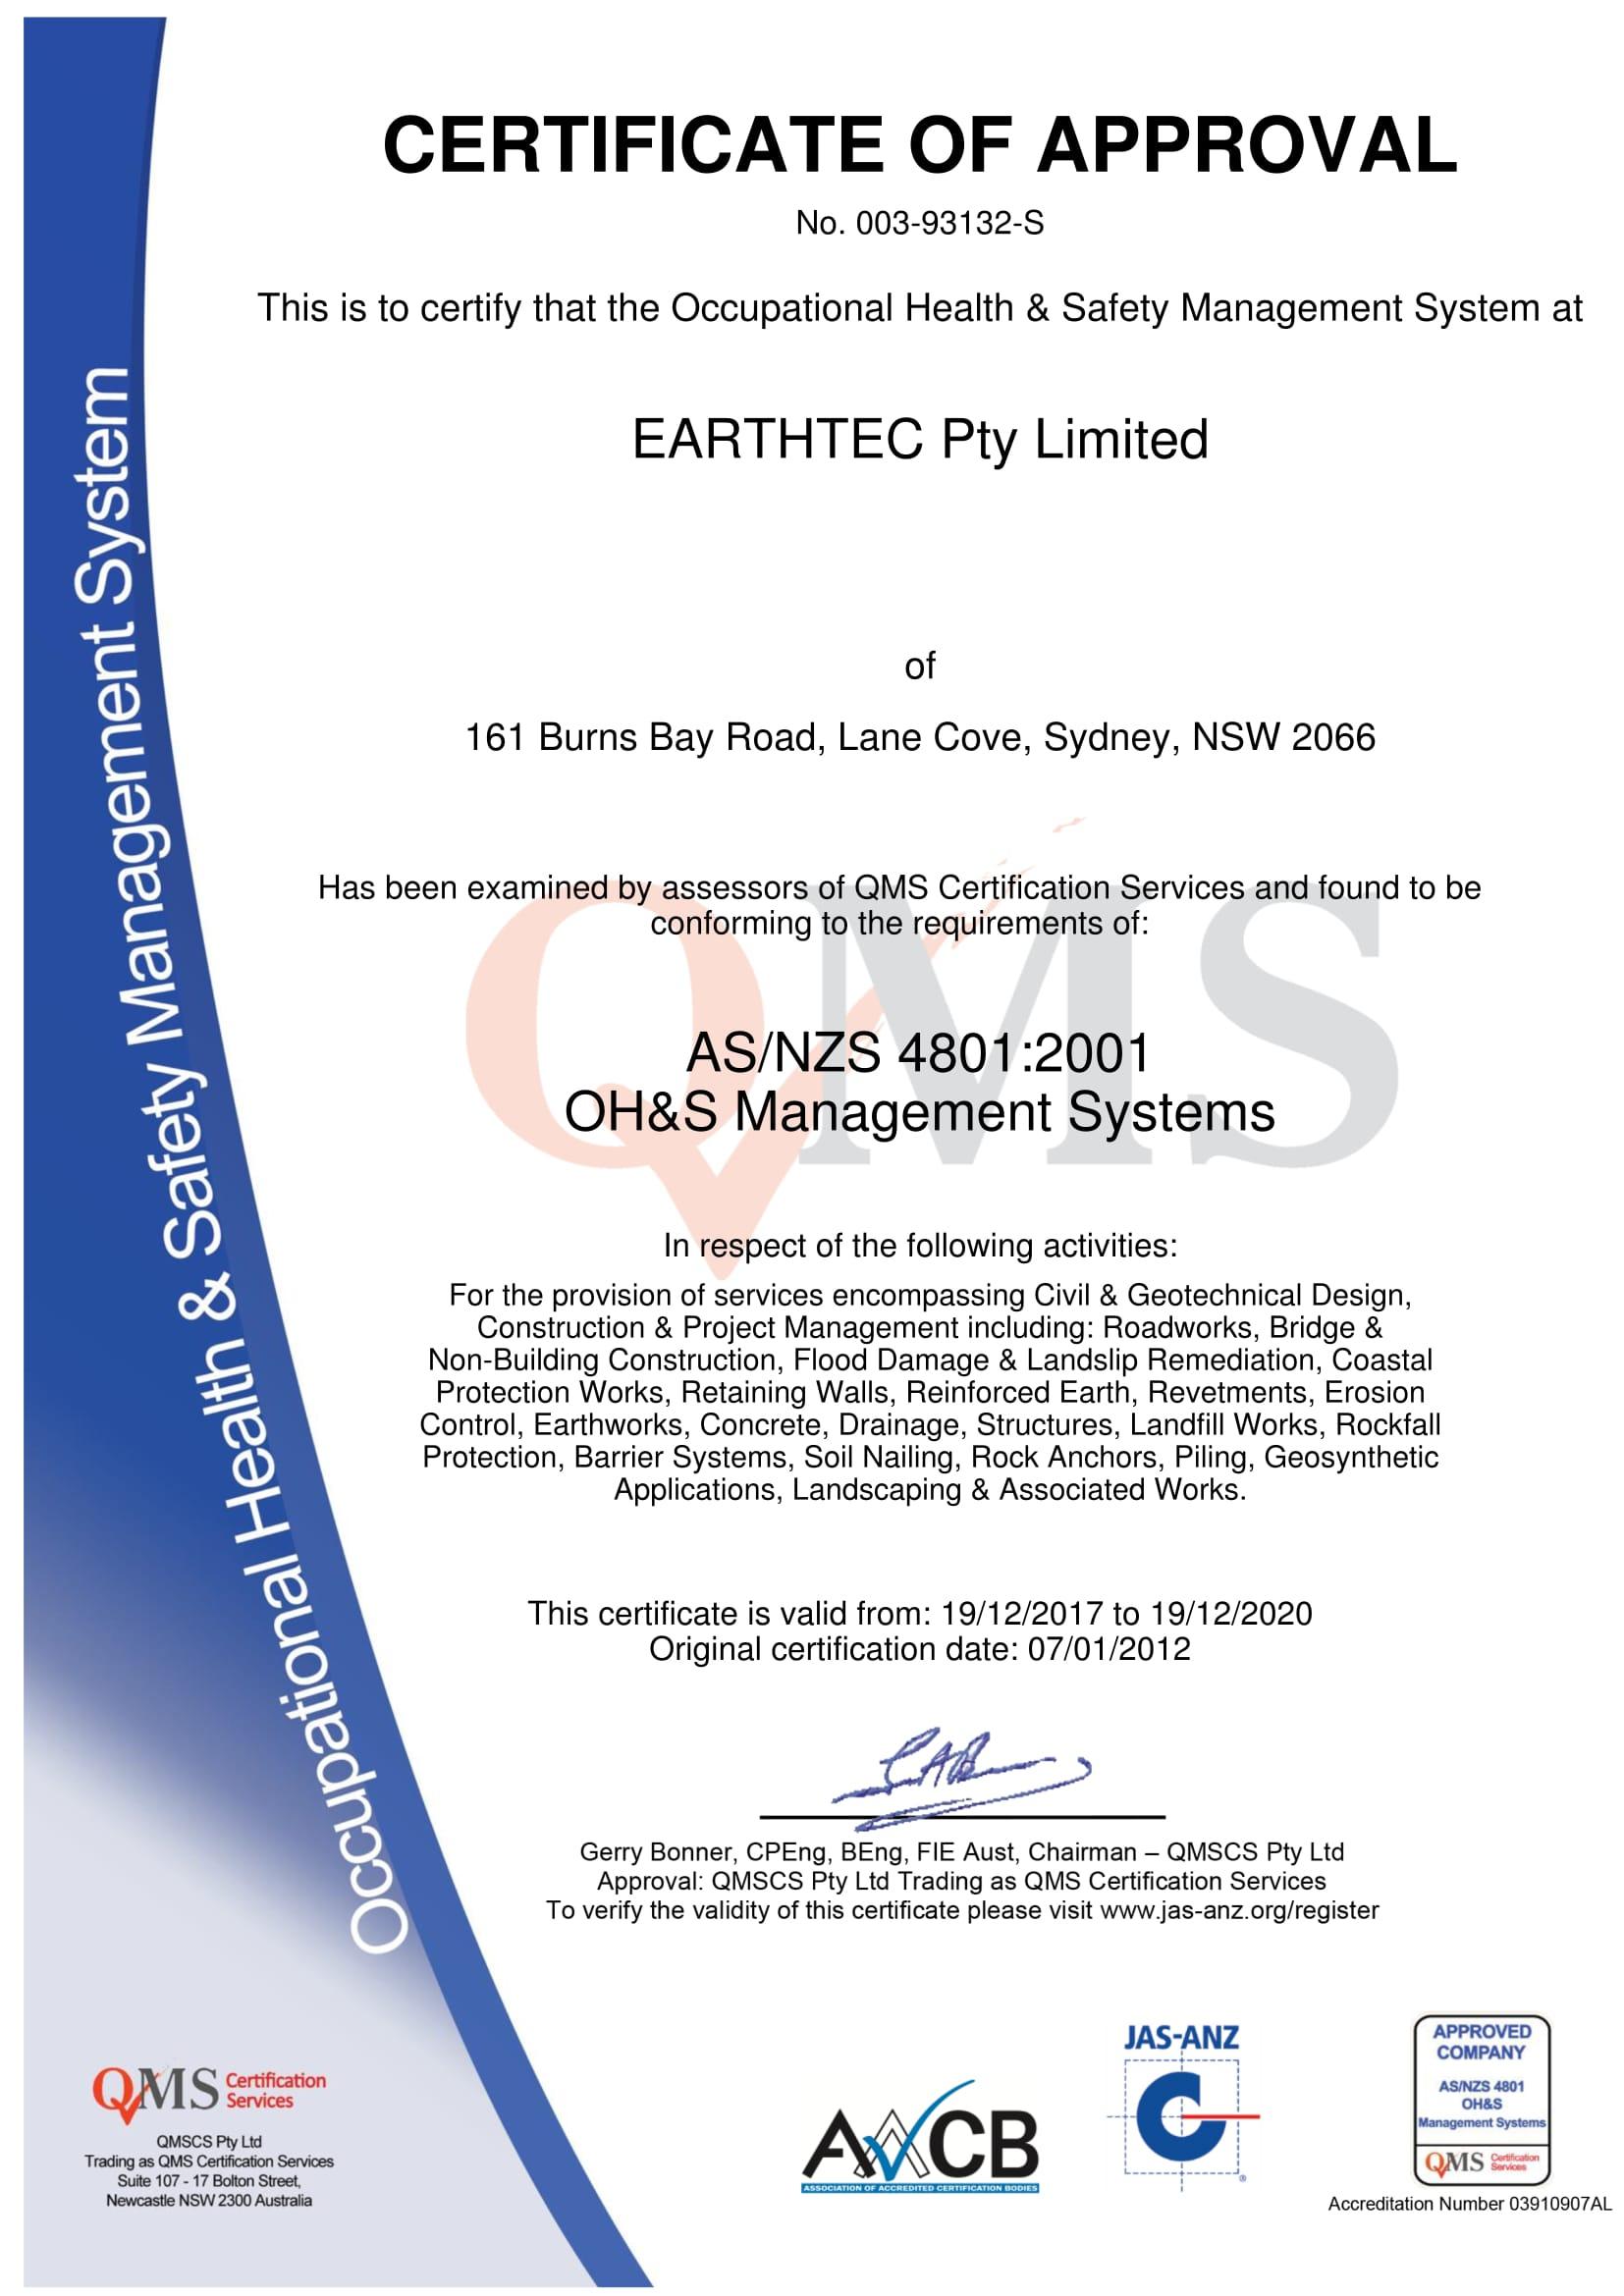 Accreditations - Earthtec